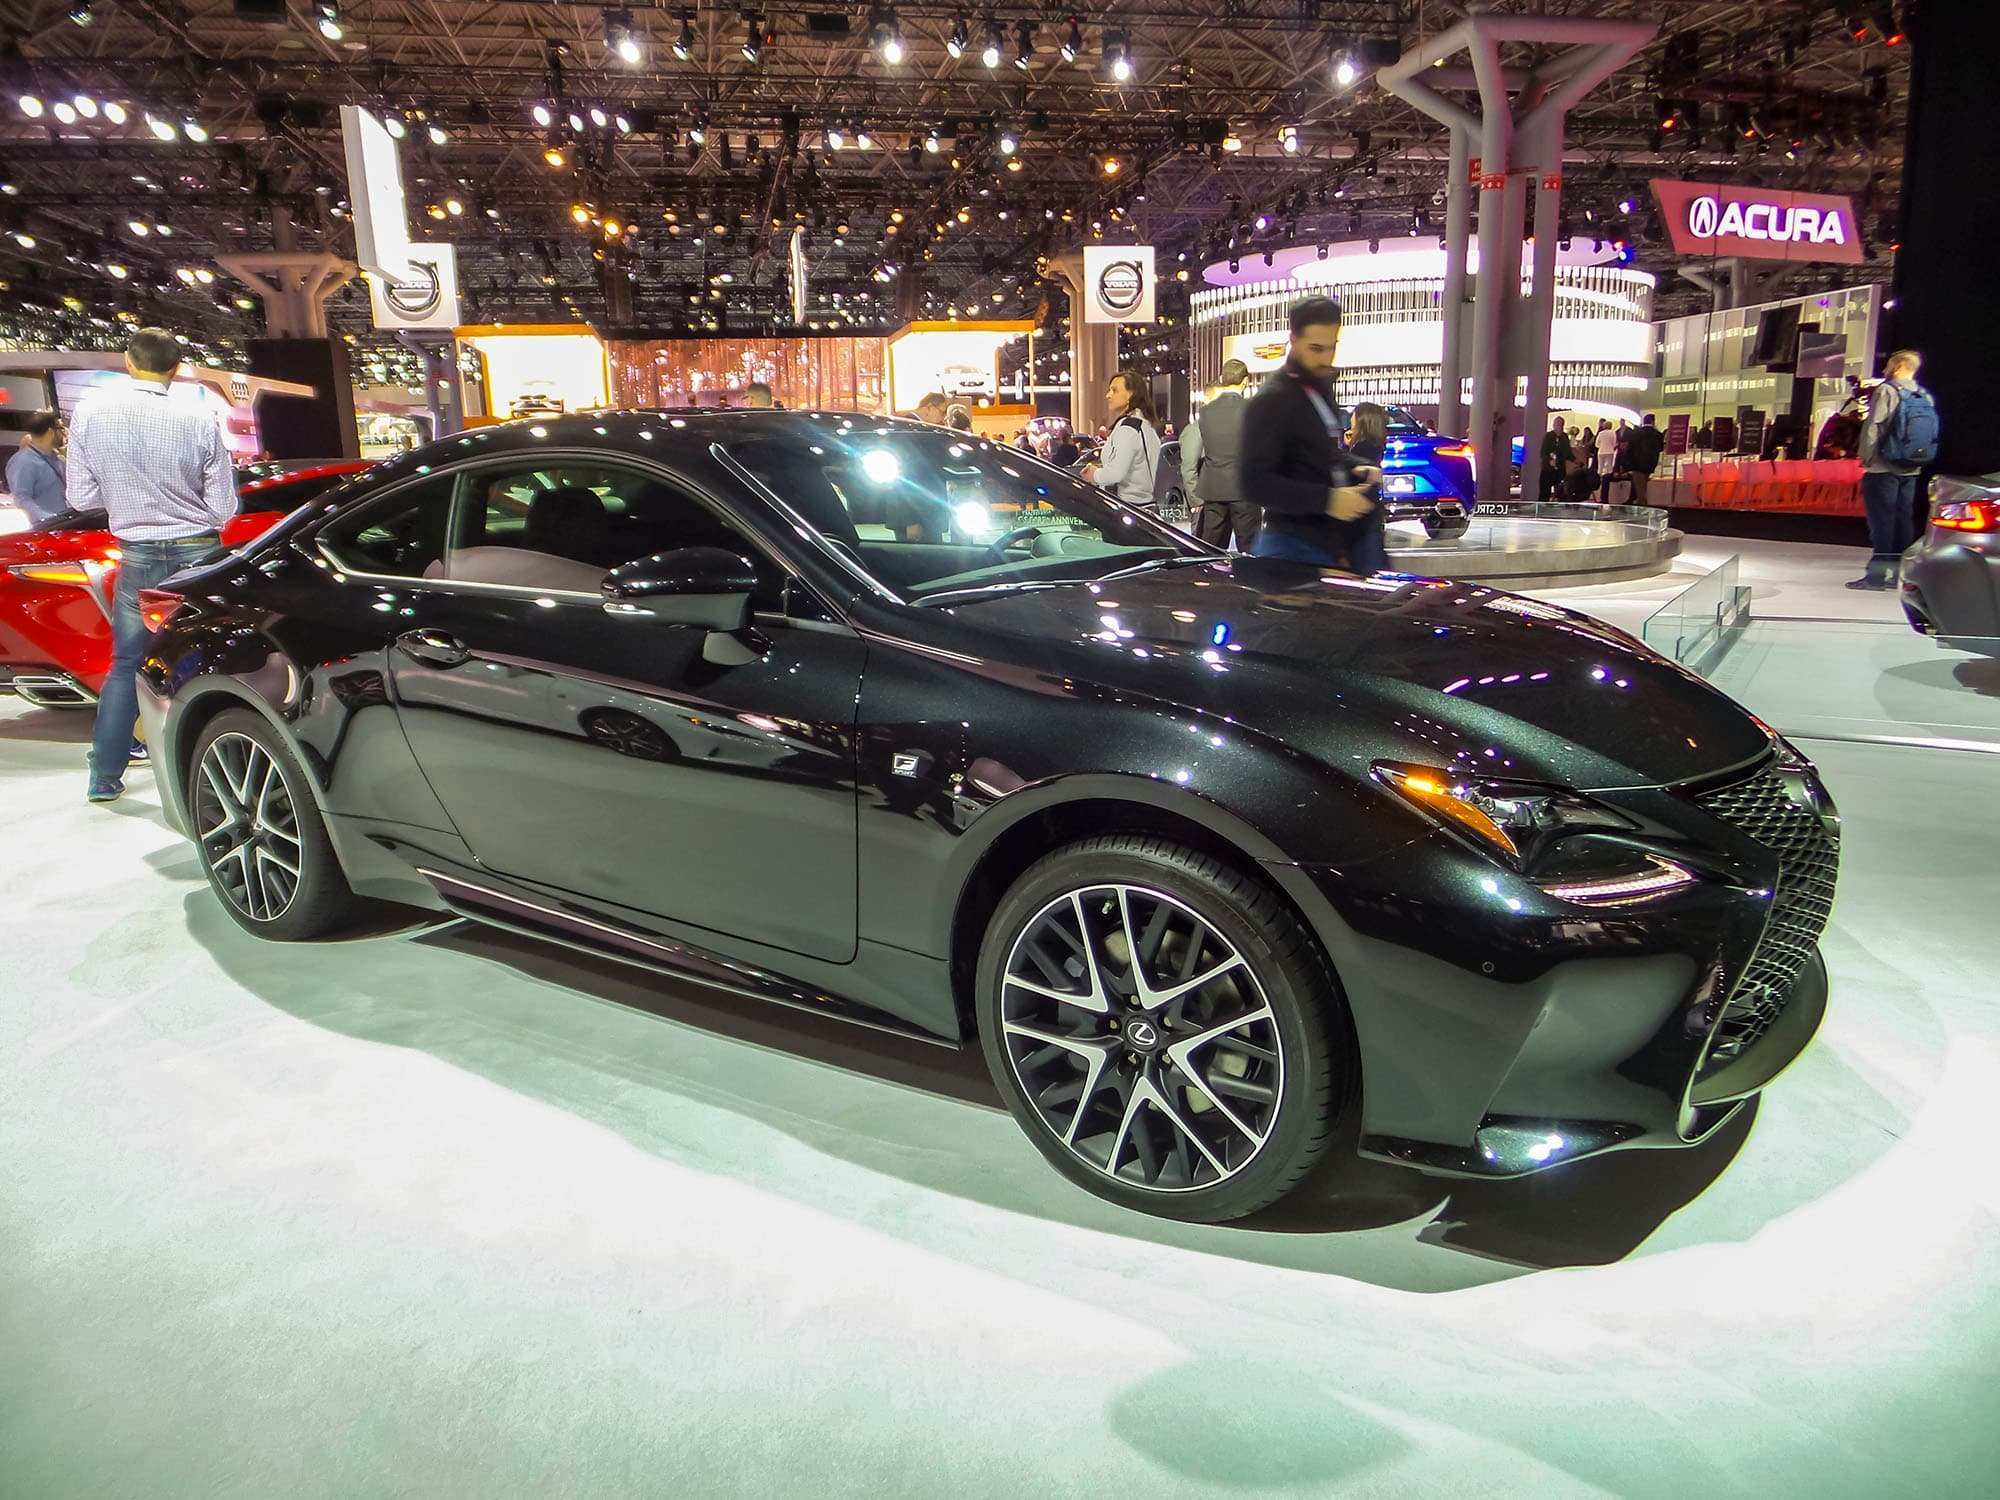 79 All New Lexus 2019 F Sport Price for Lexus 2019 F Sport